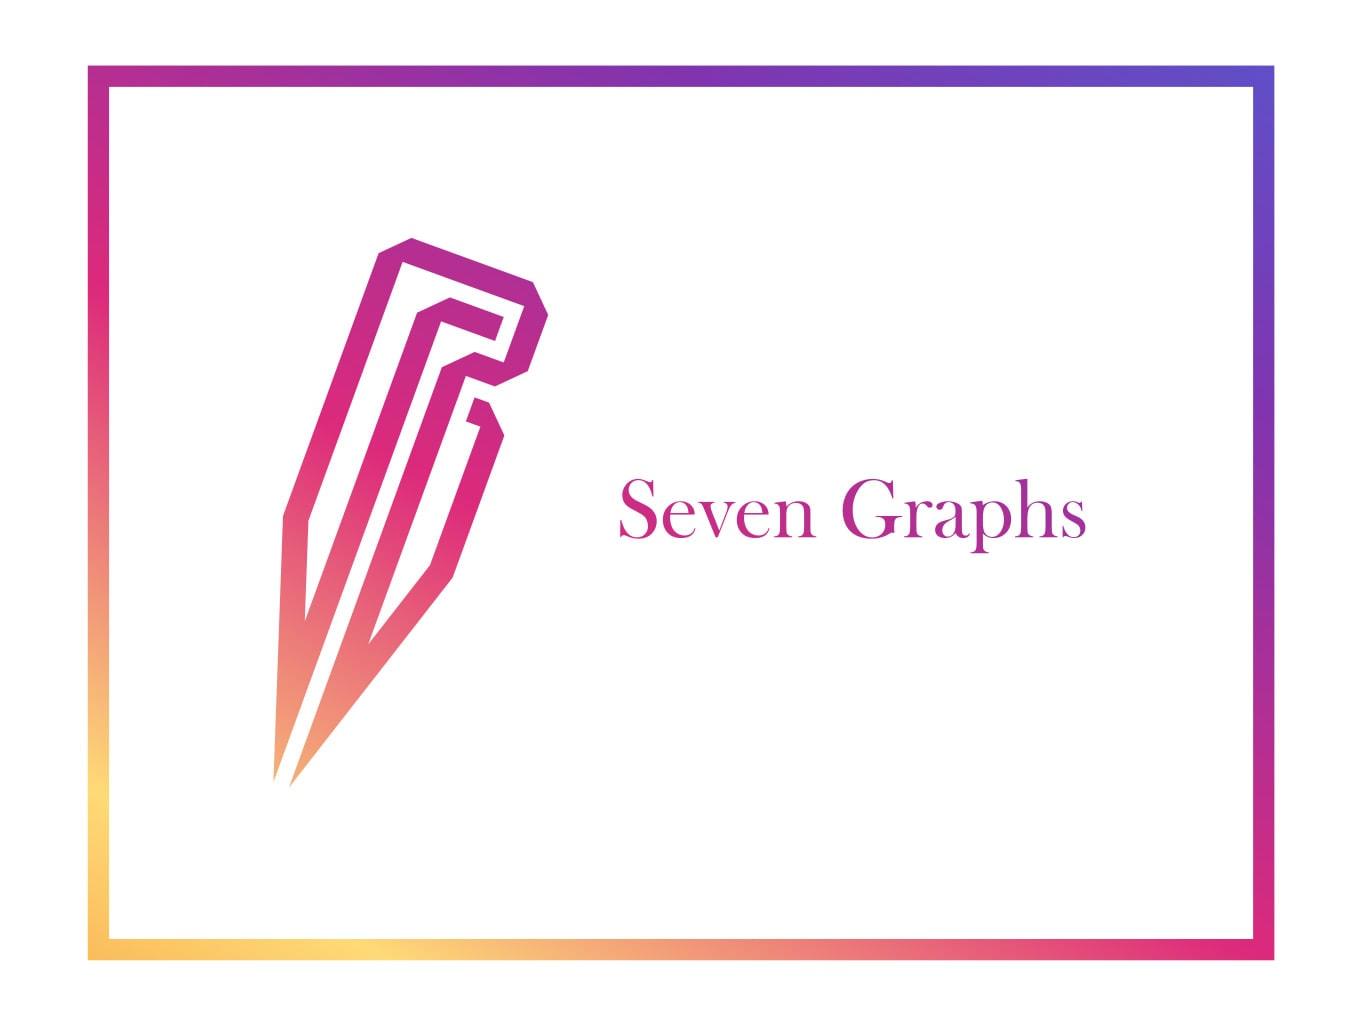 Seven Graphs